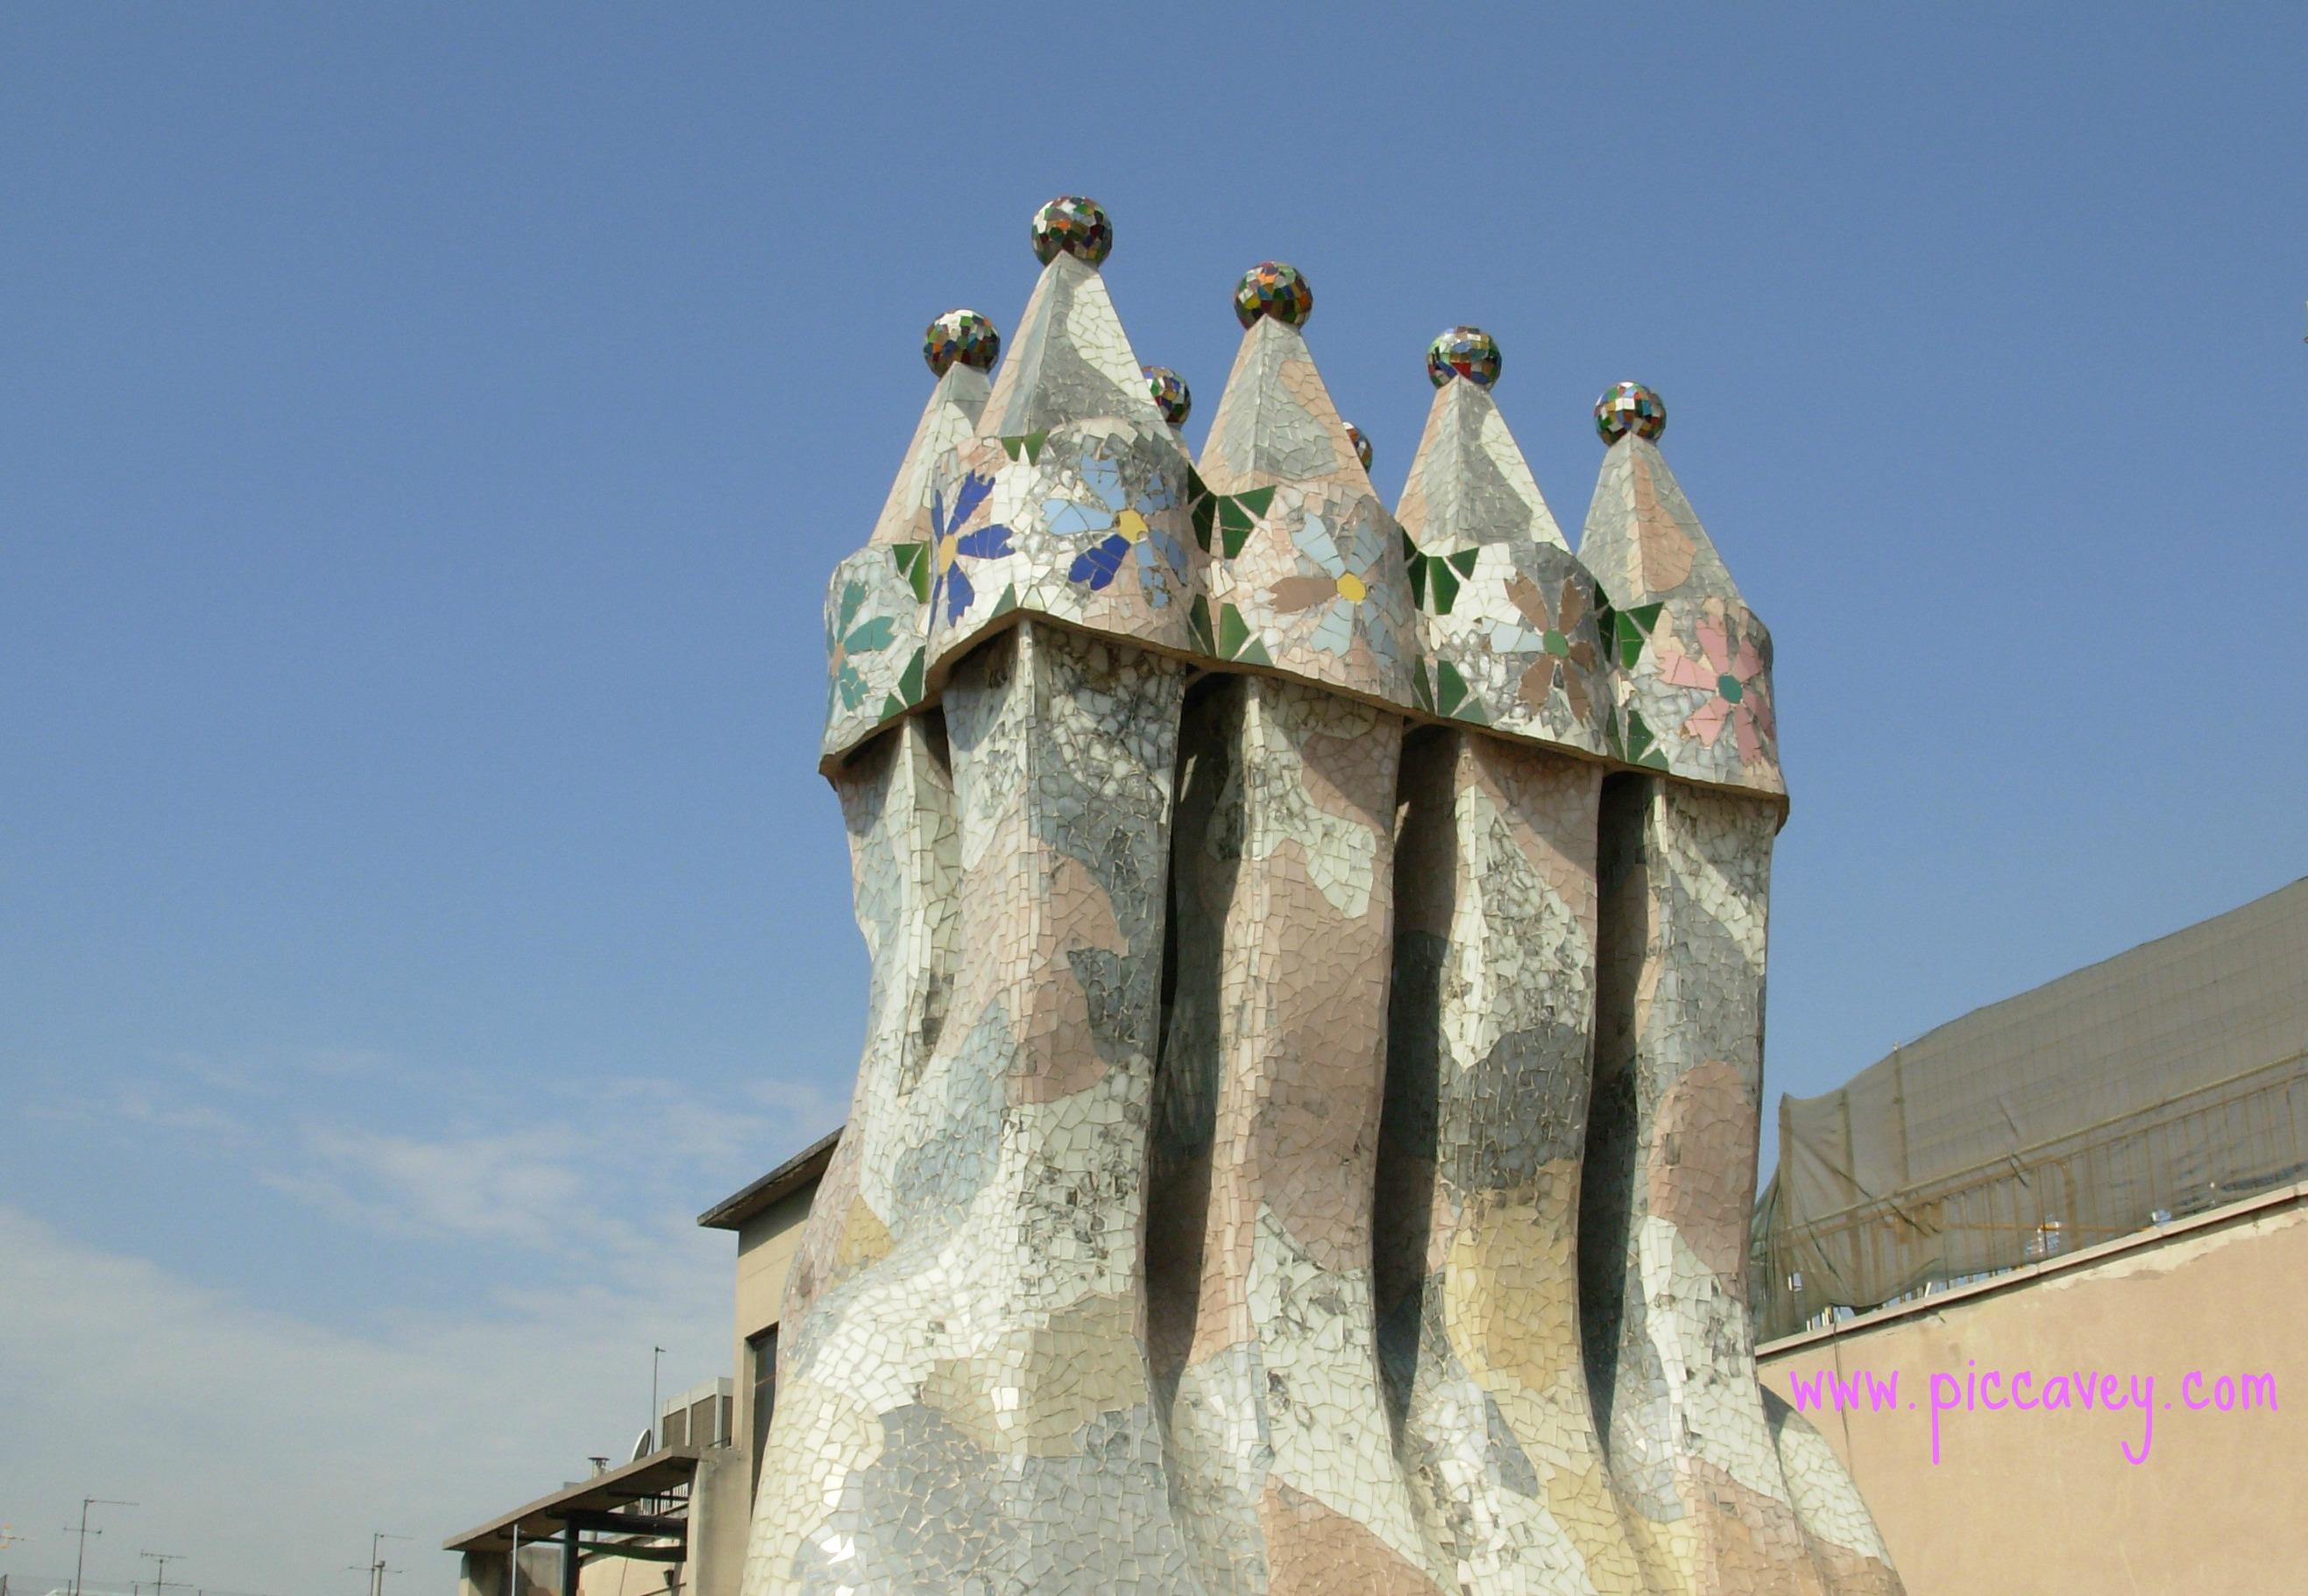 Gaudi Architecture in Barcelona Spain